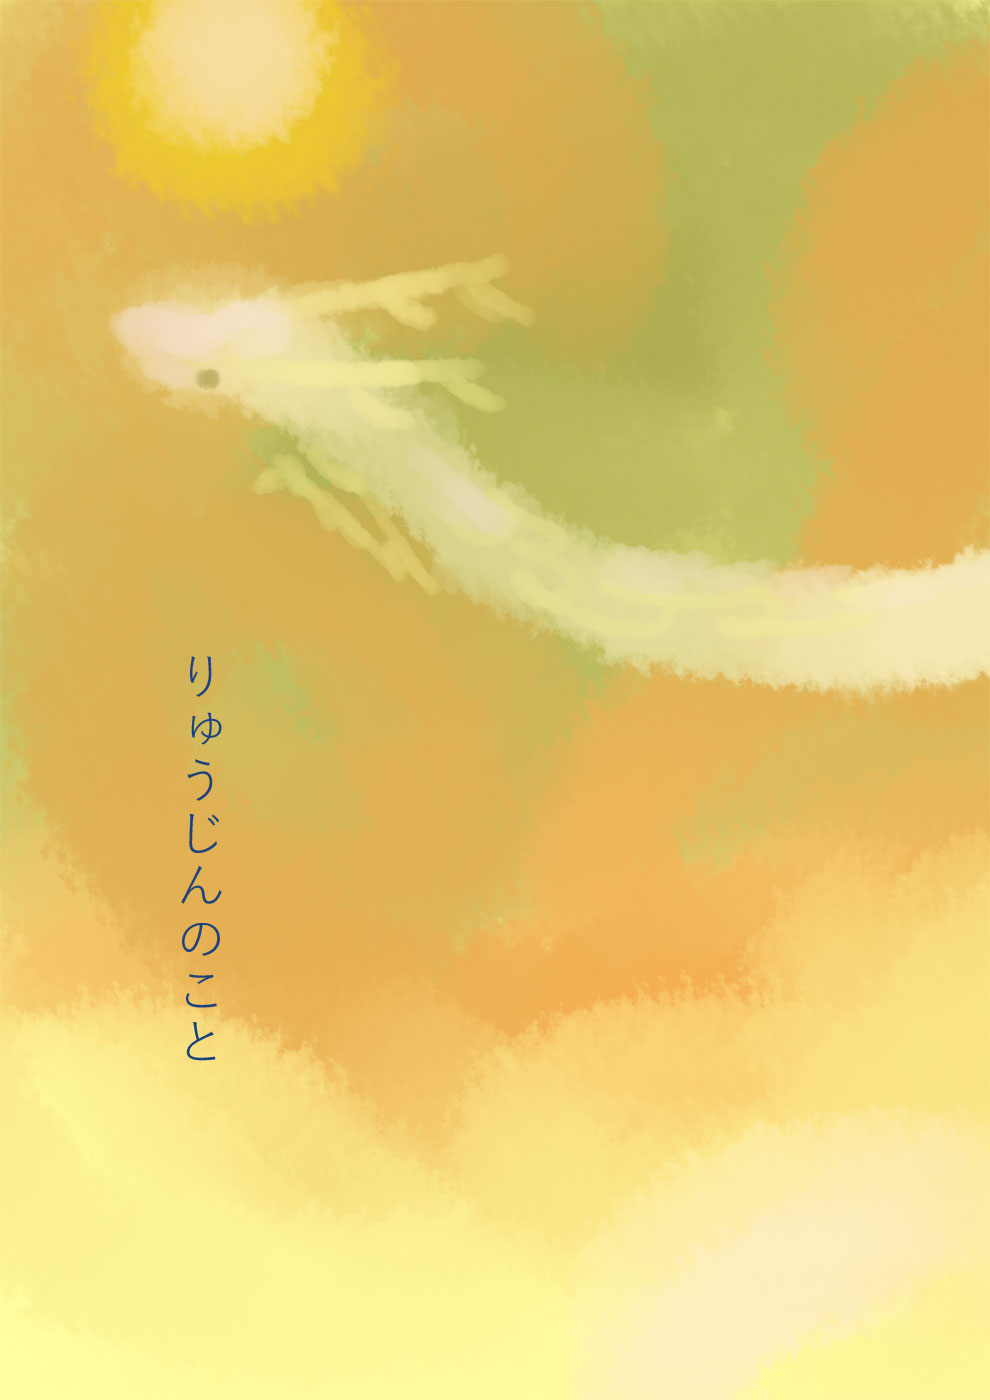 http://ahito.com/comic/ehon/kamiuta/img/2018/20180505_2/01.jpg